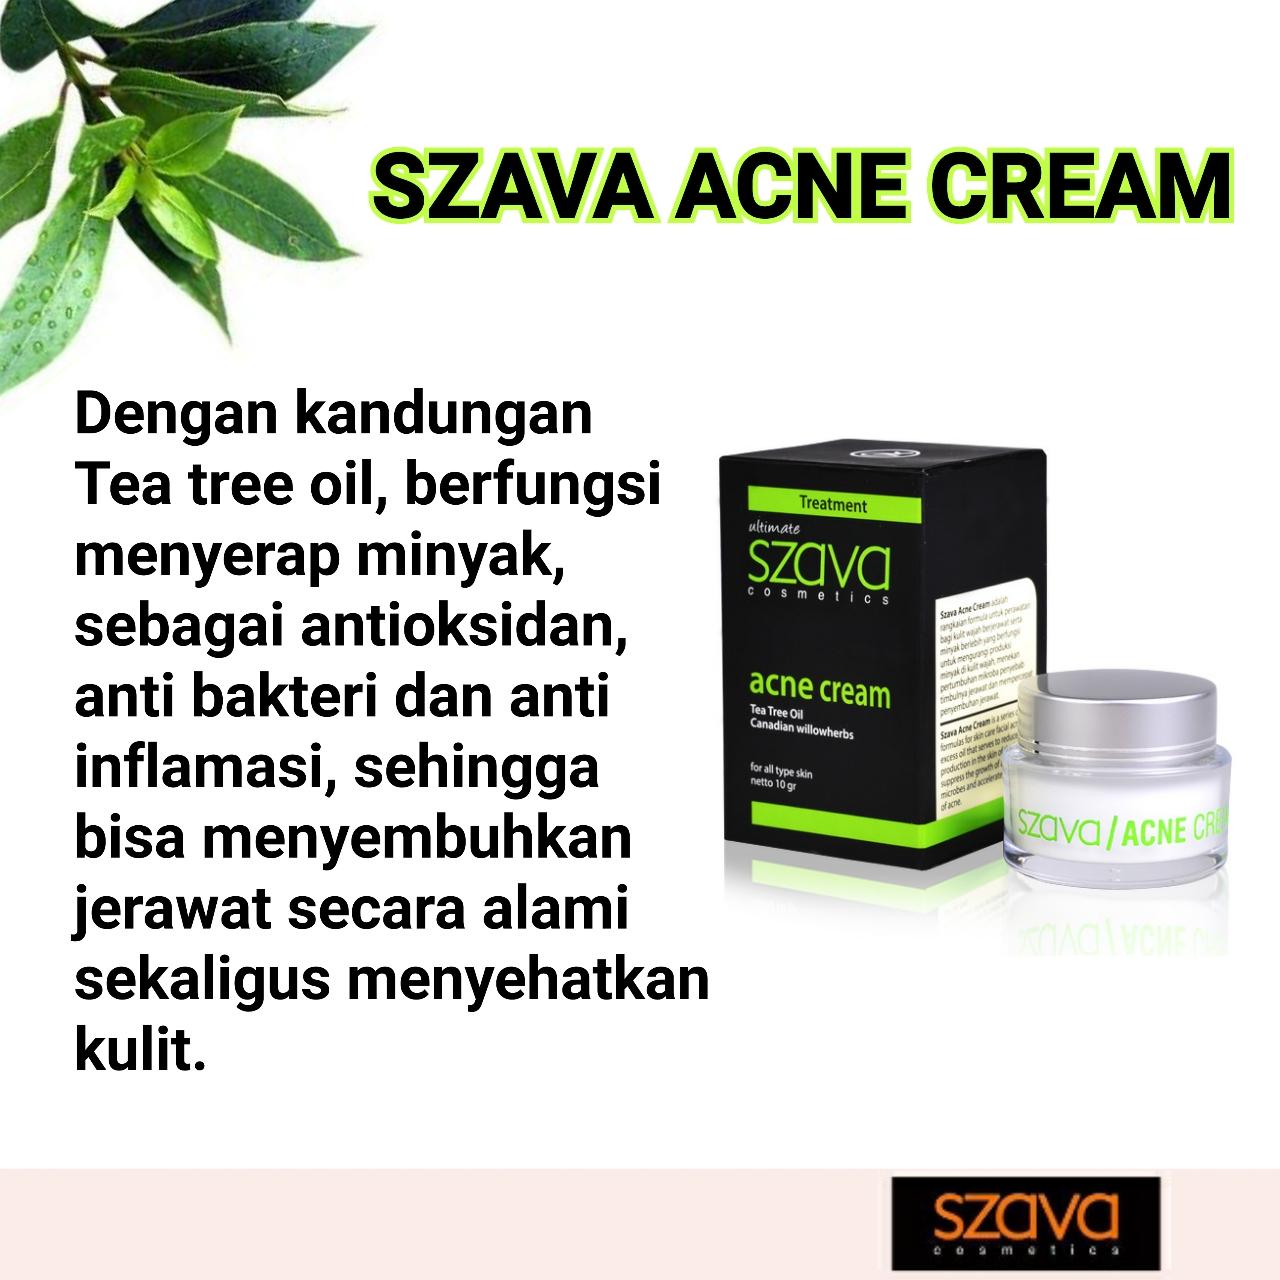 Manfaat Tea Tree Oil Dalam Szava Acne Cream